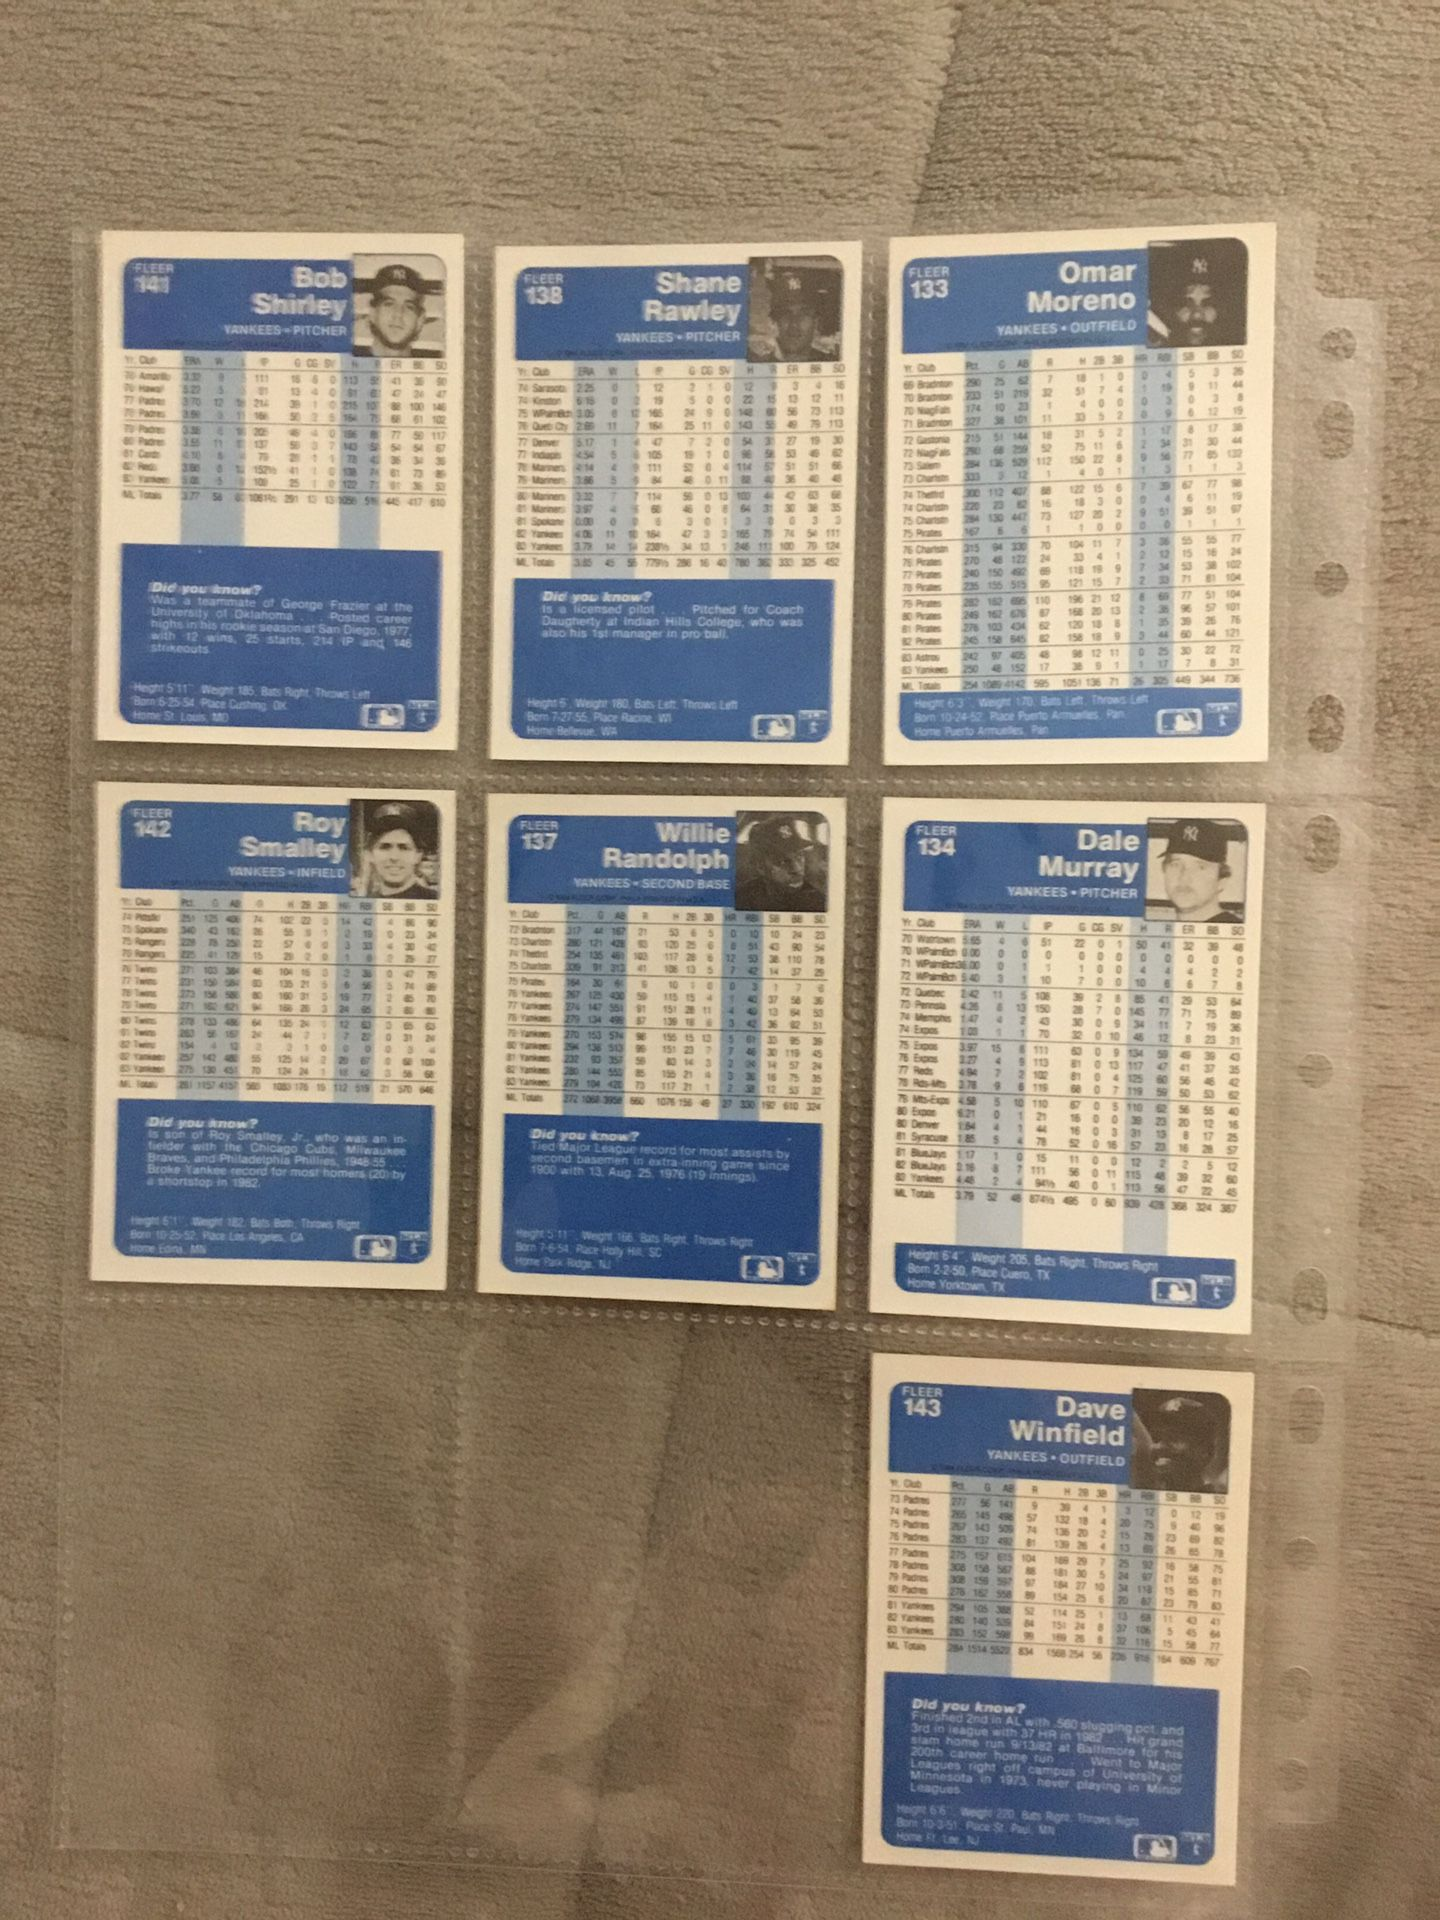 1984/1985 Fleer baseball cards. 562 total cards.